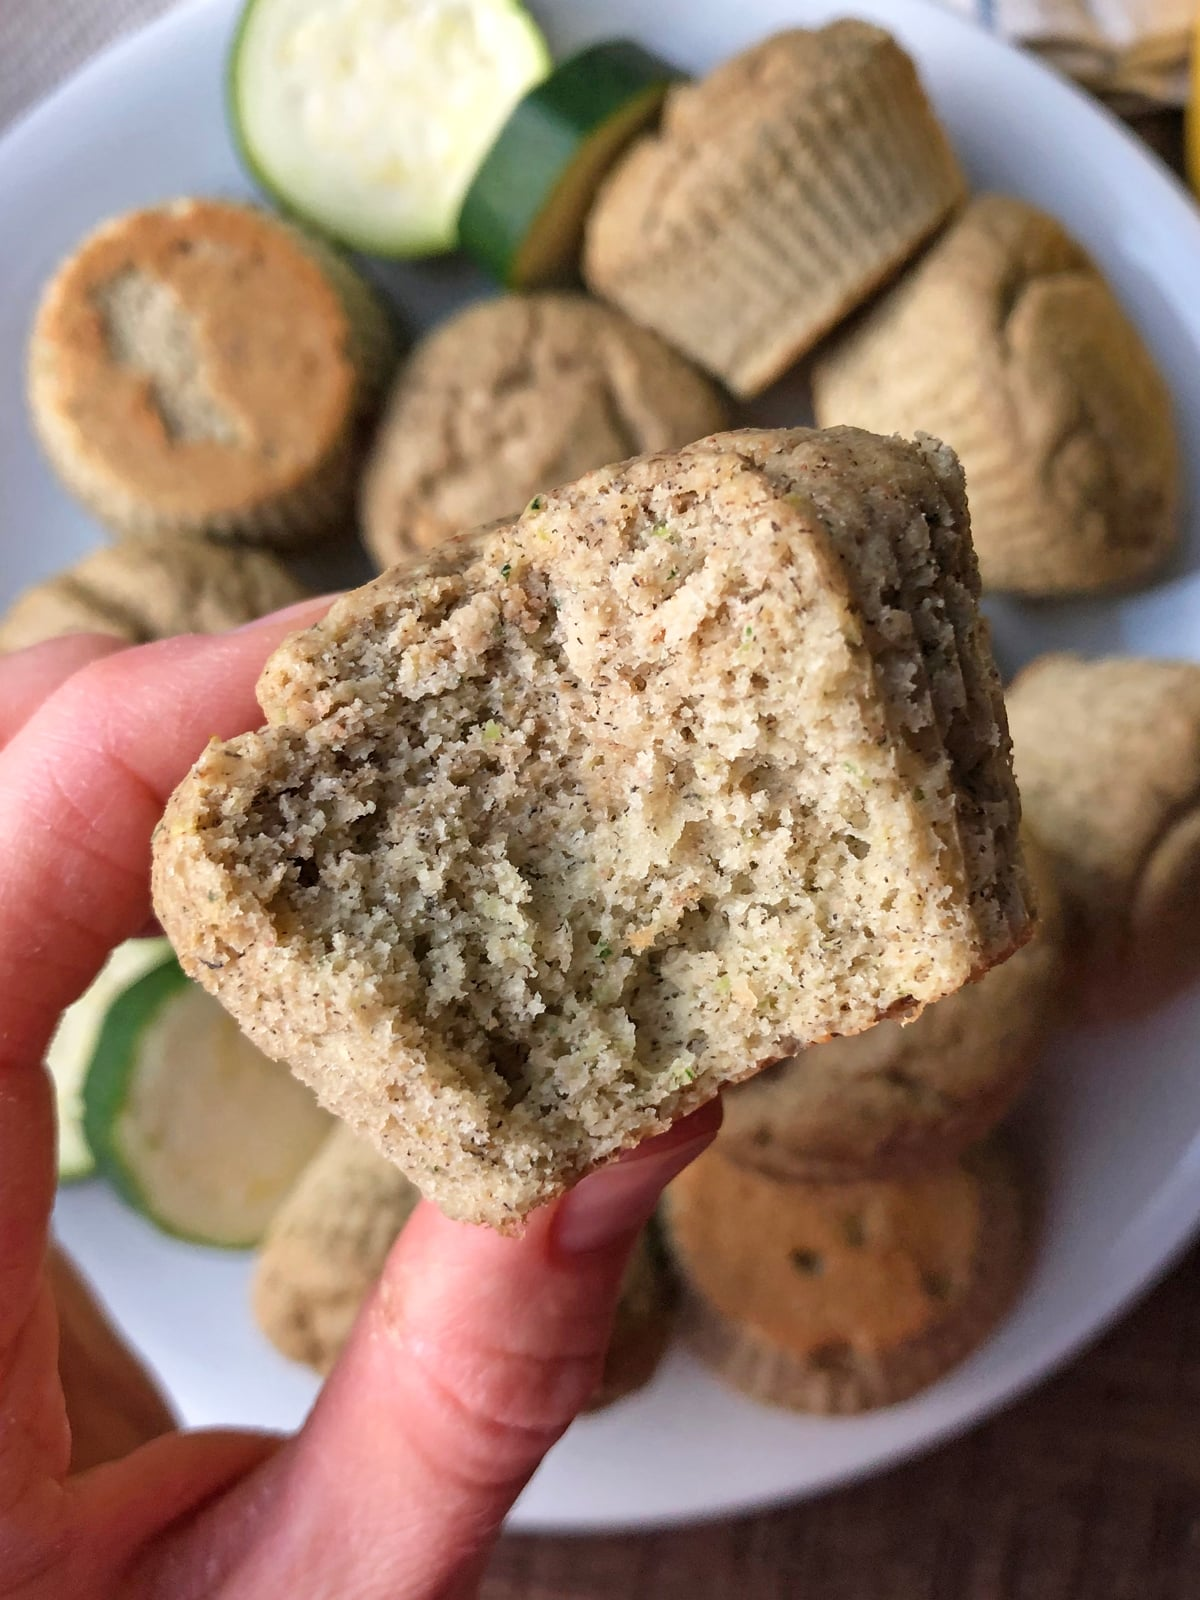 healthy-buckwheat-muffins-with-banana-and-zucchini